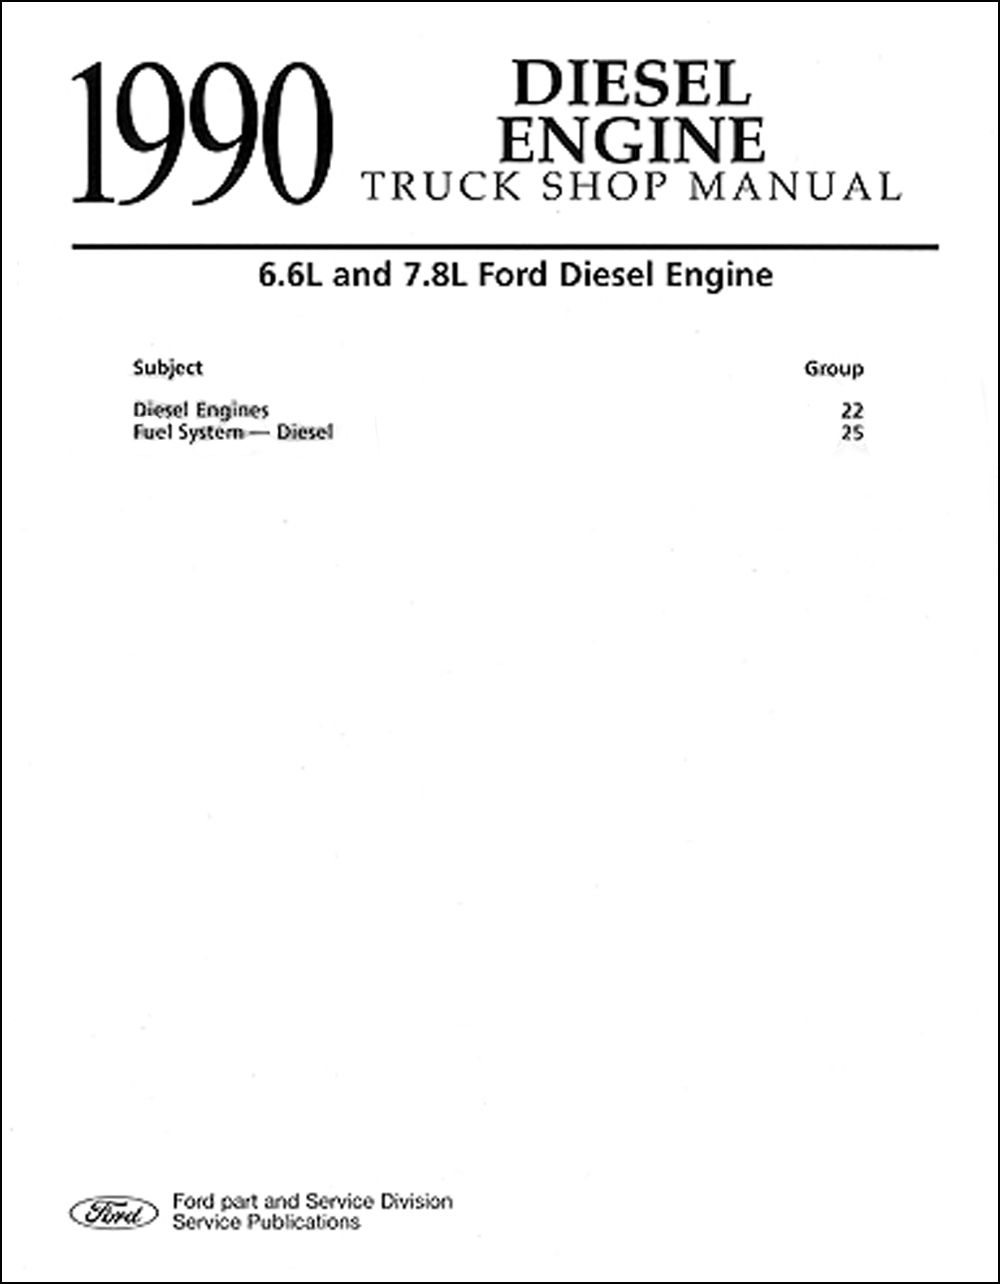 medium resolution of 1990 ford truck diesel engine repair manual original